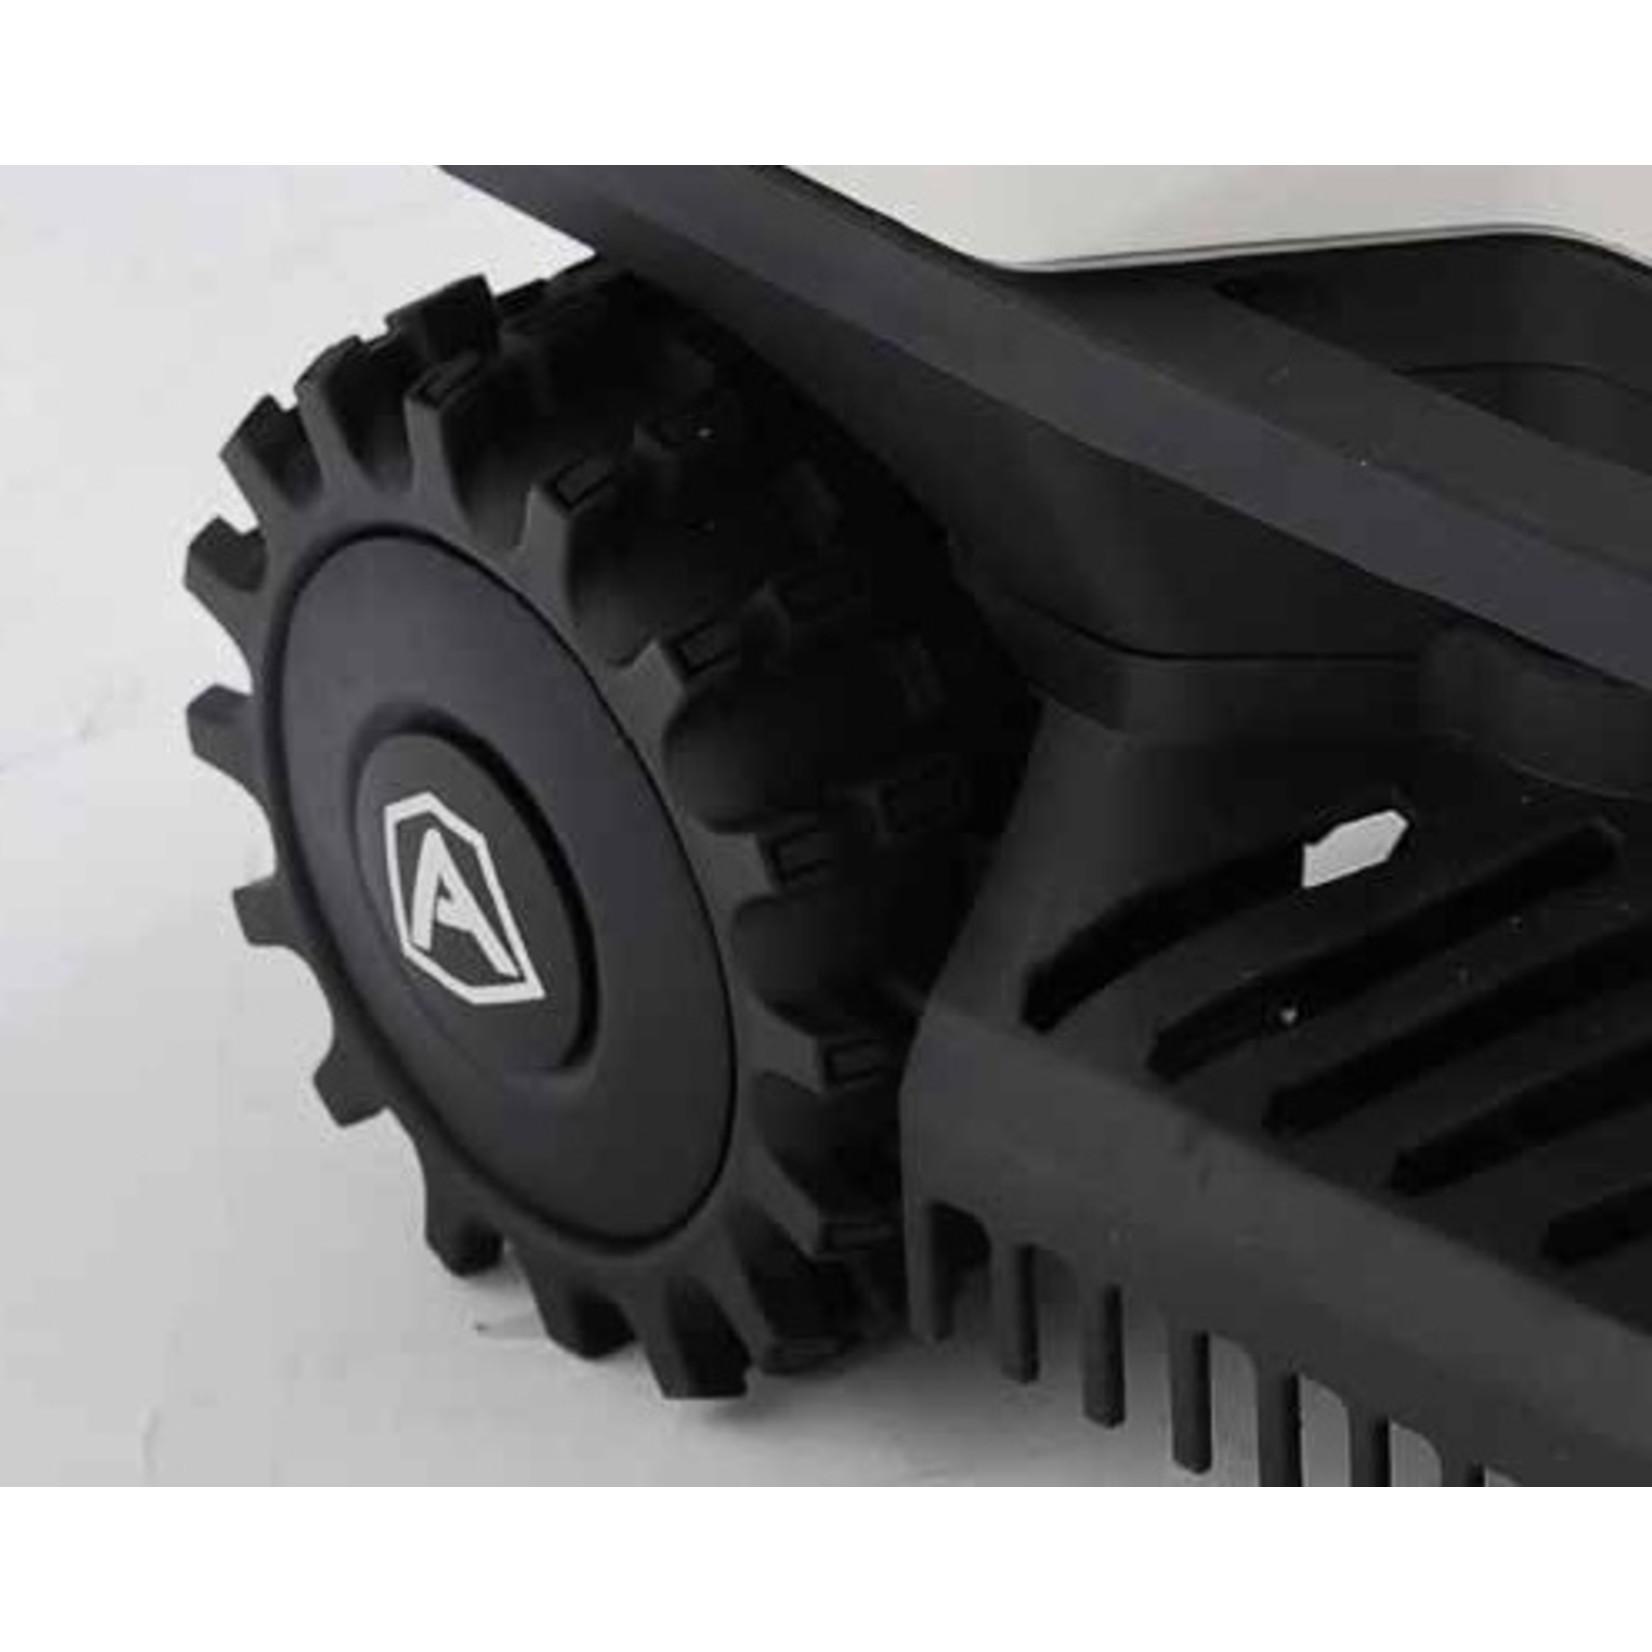 Ambrogio Ambrogio Nextline Twenty Elite Rasenmähroboter Modell 2021